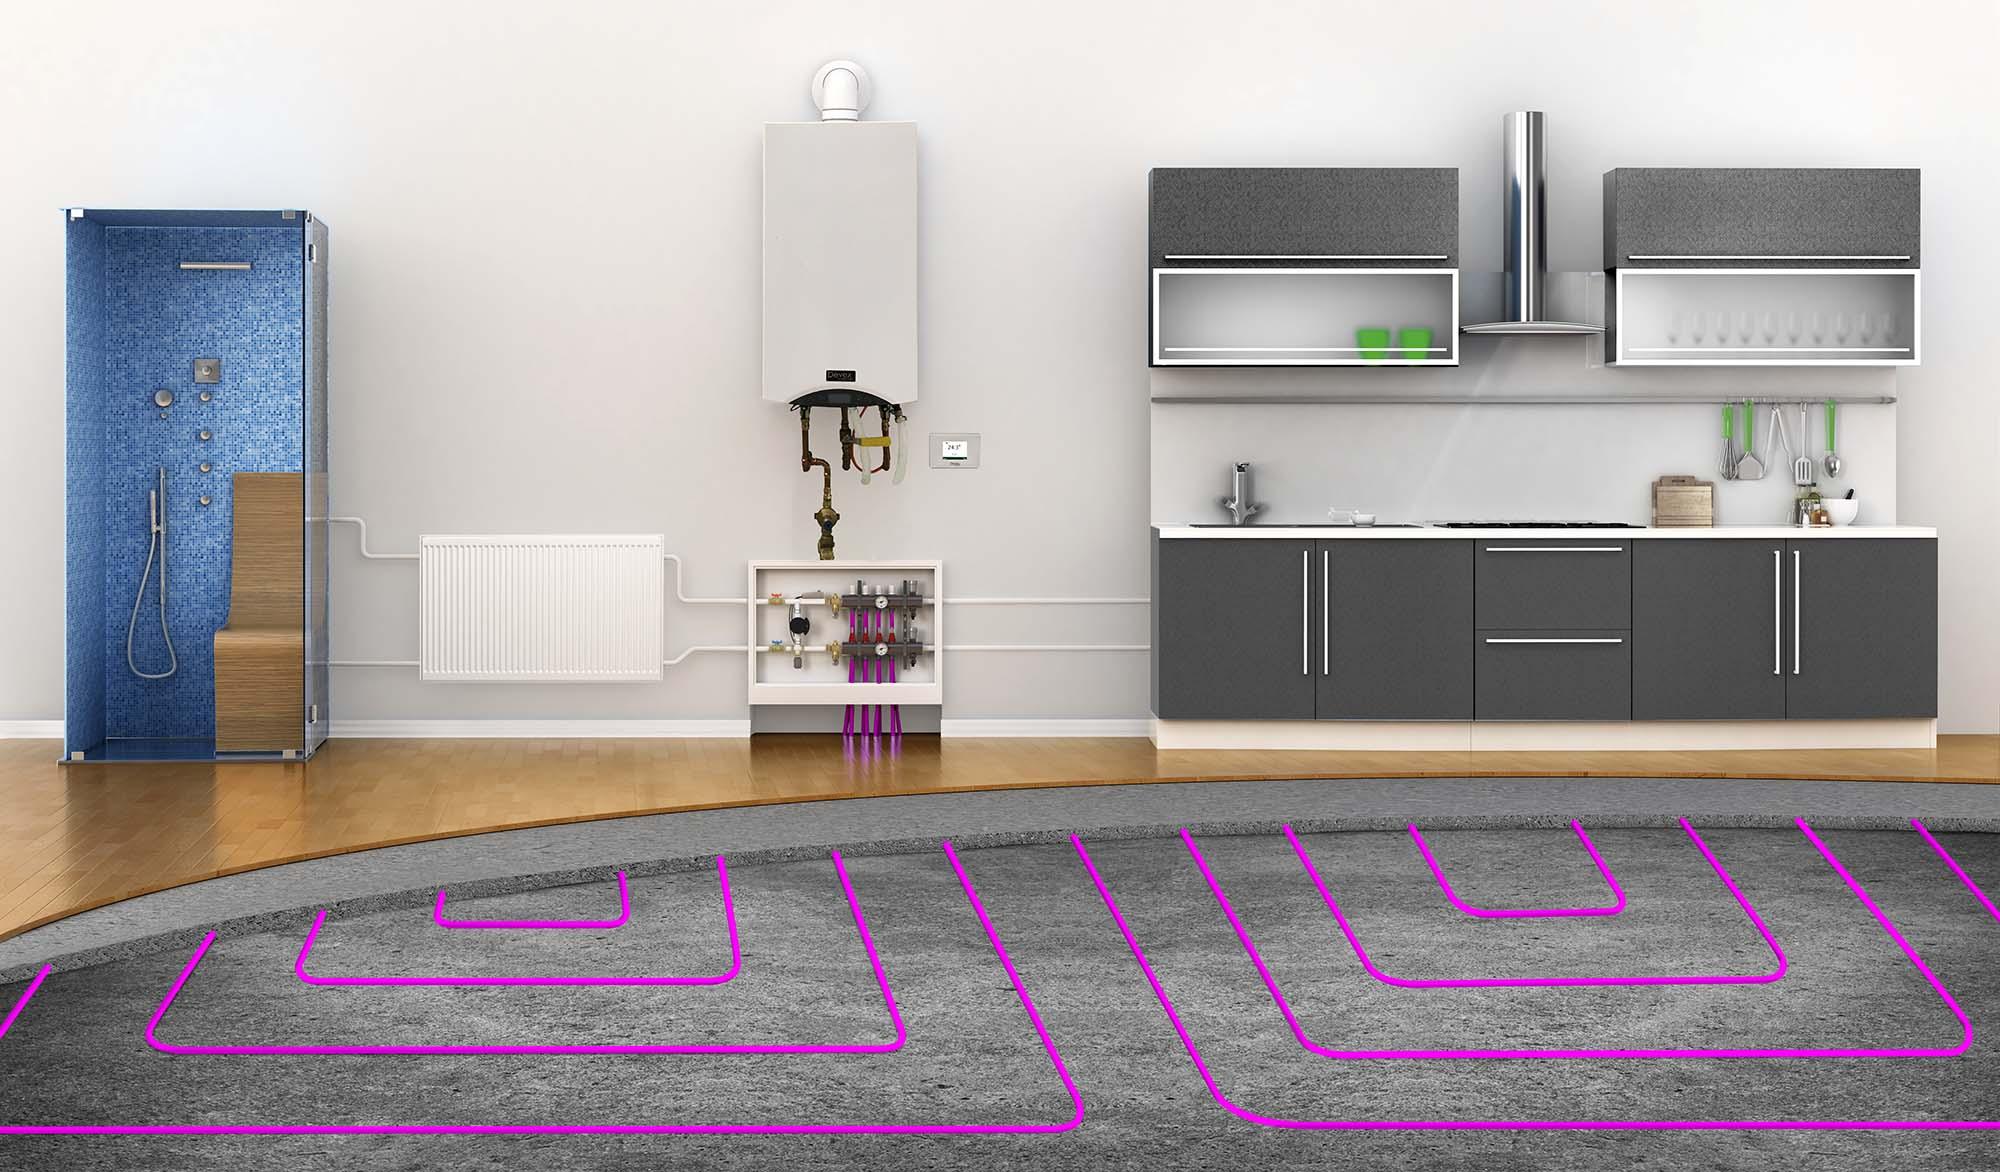 hight resolution of hydronic floor heating